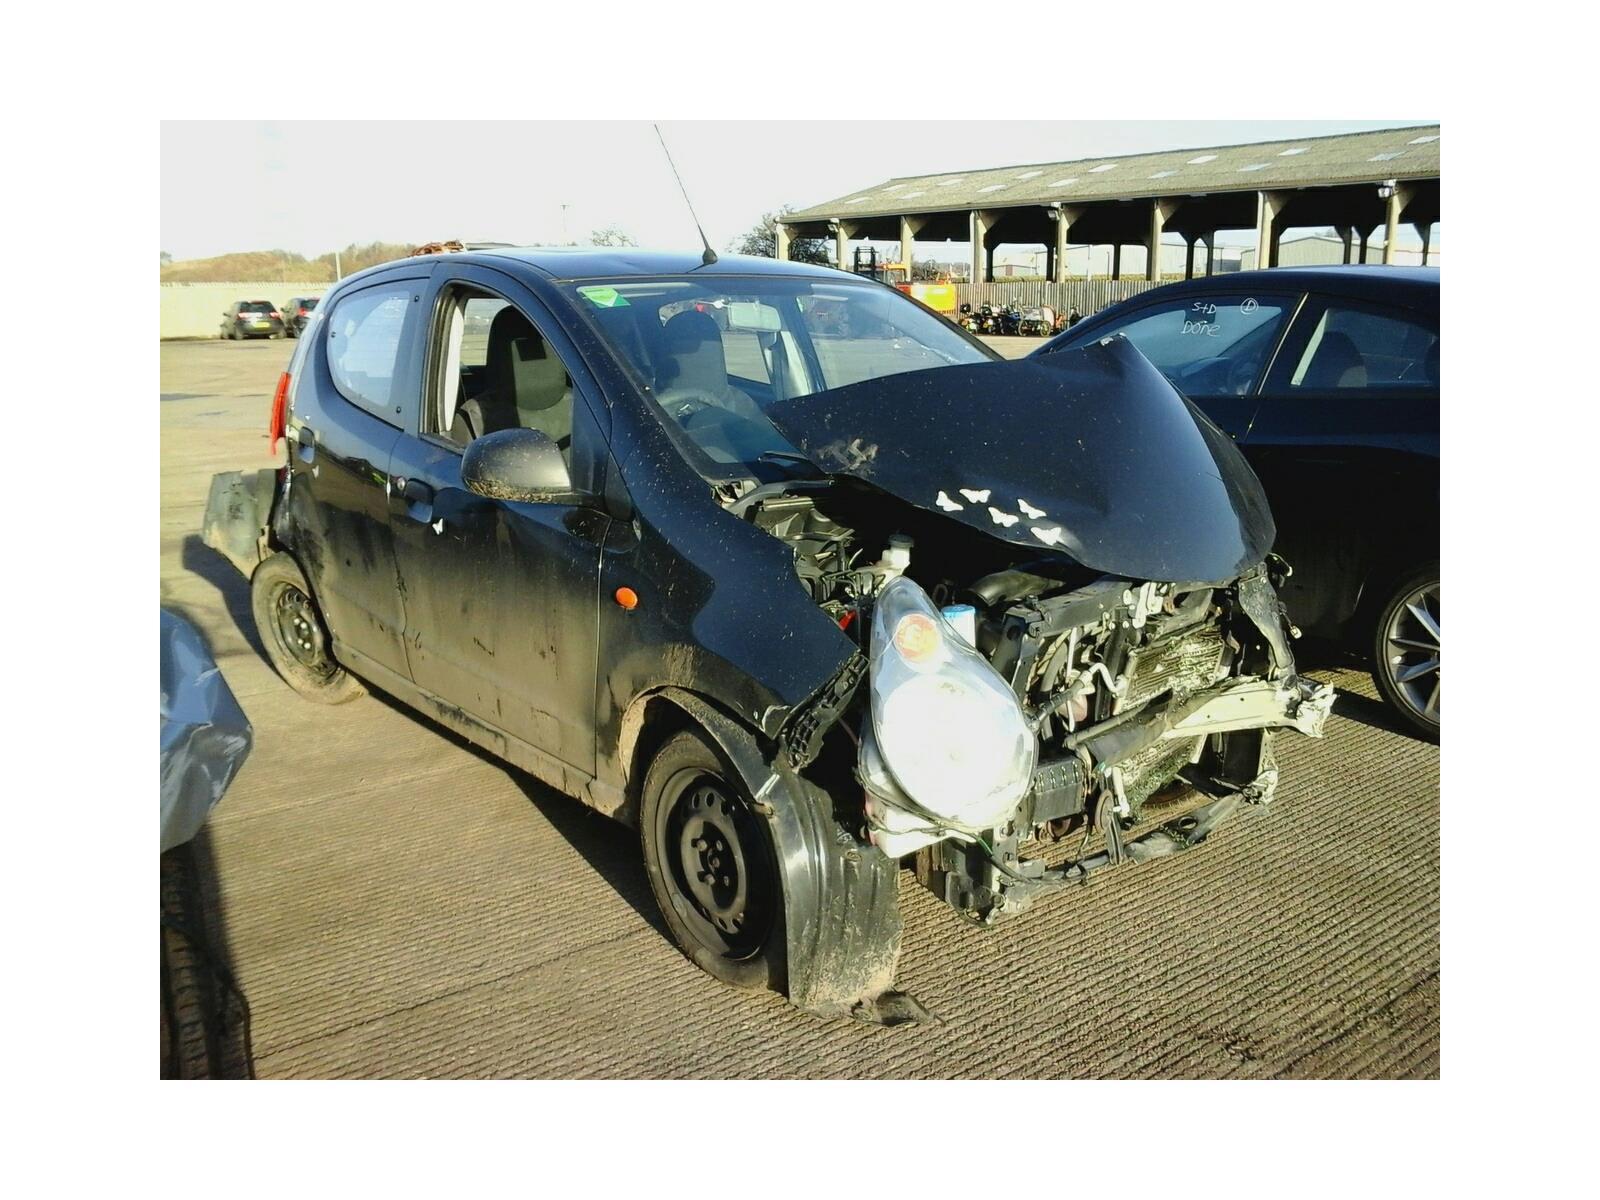 2011 suzuki alto 2009 on 5 door hatchback petrol manual breaking rh motorhog co uk 2016 Suzuki Alto 2017 Suzuki Alto